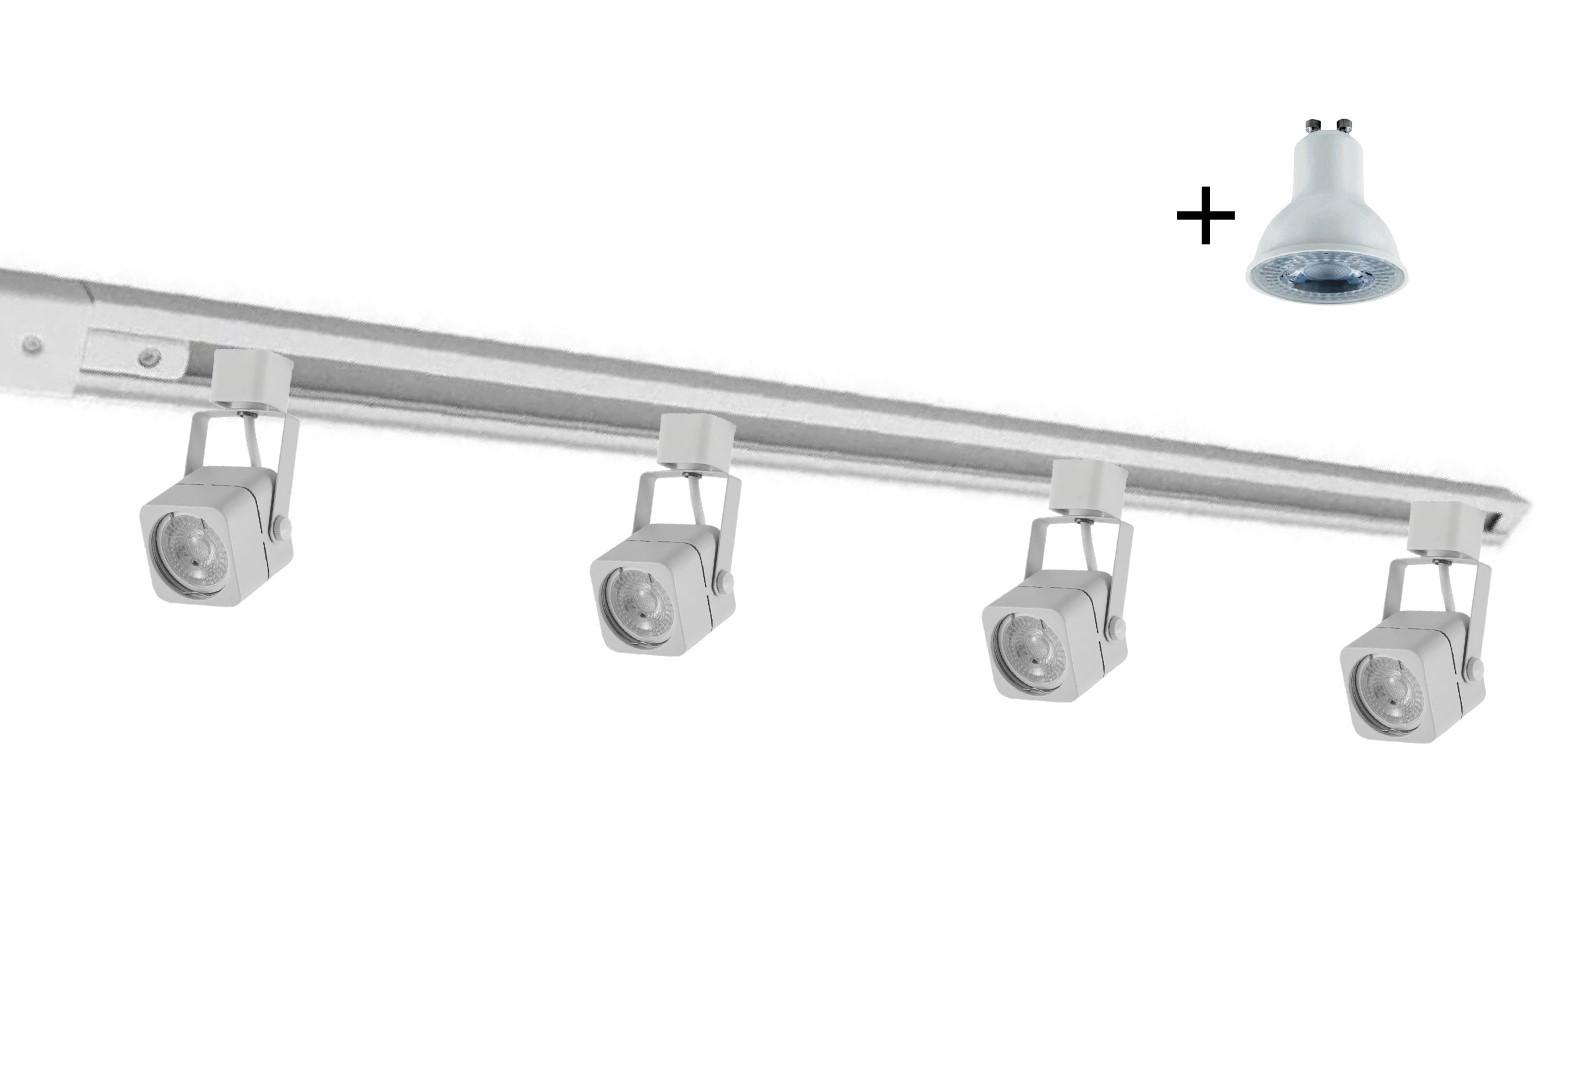 Kit Trilho Eletrificado 2m Branco Nordecor + 4 Spot Quad MR16 / GU10 + Lâmp. Led Luz Quente